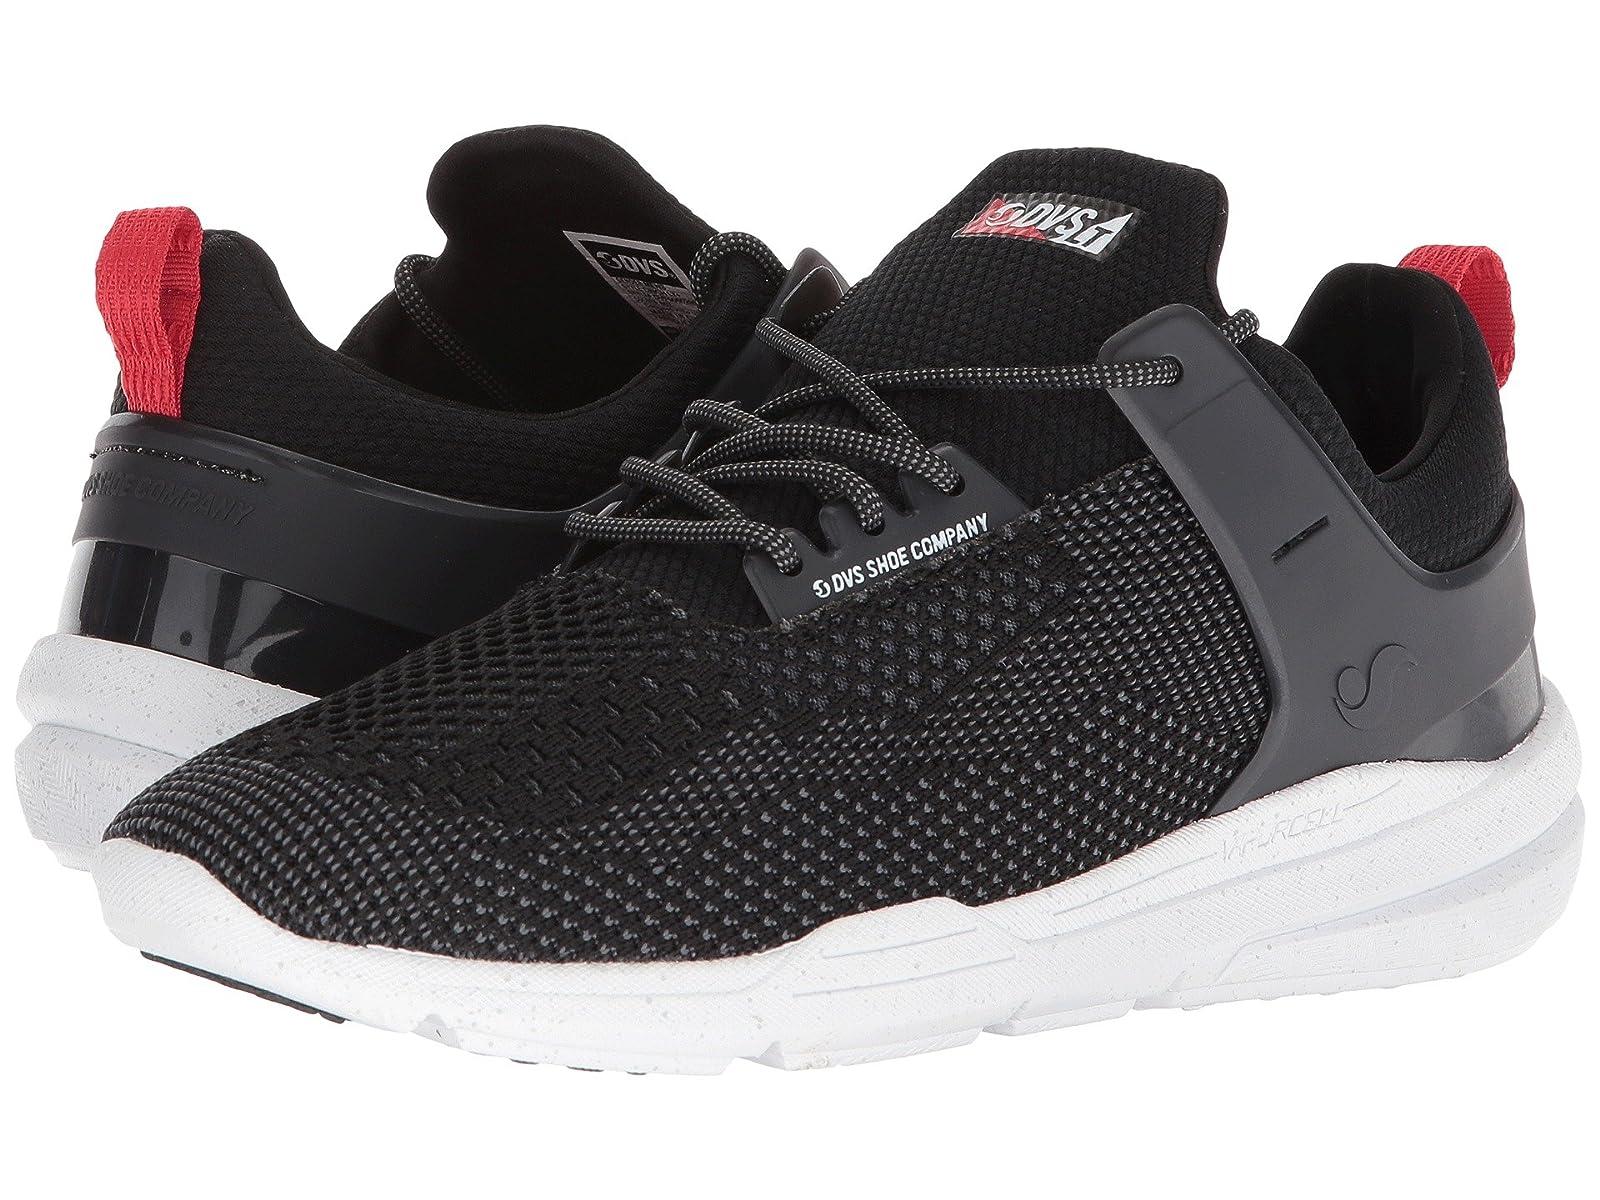 DVS Shoe Company Cinch LT+Atmospheric grades have affordable shoes